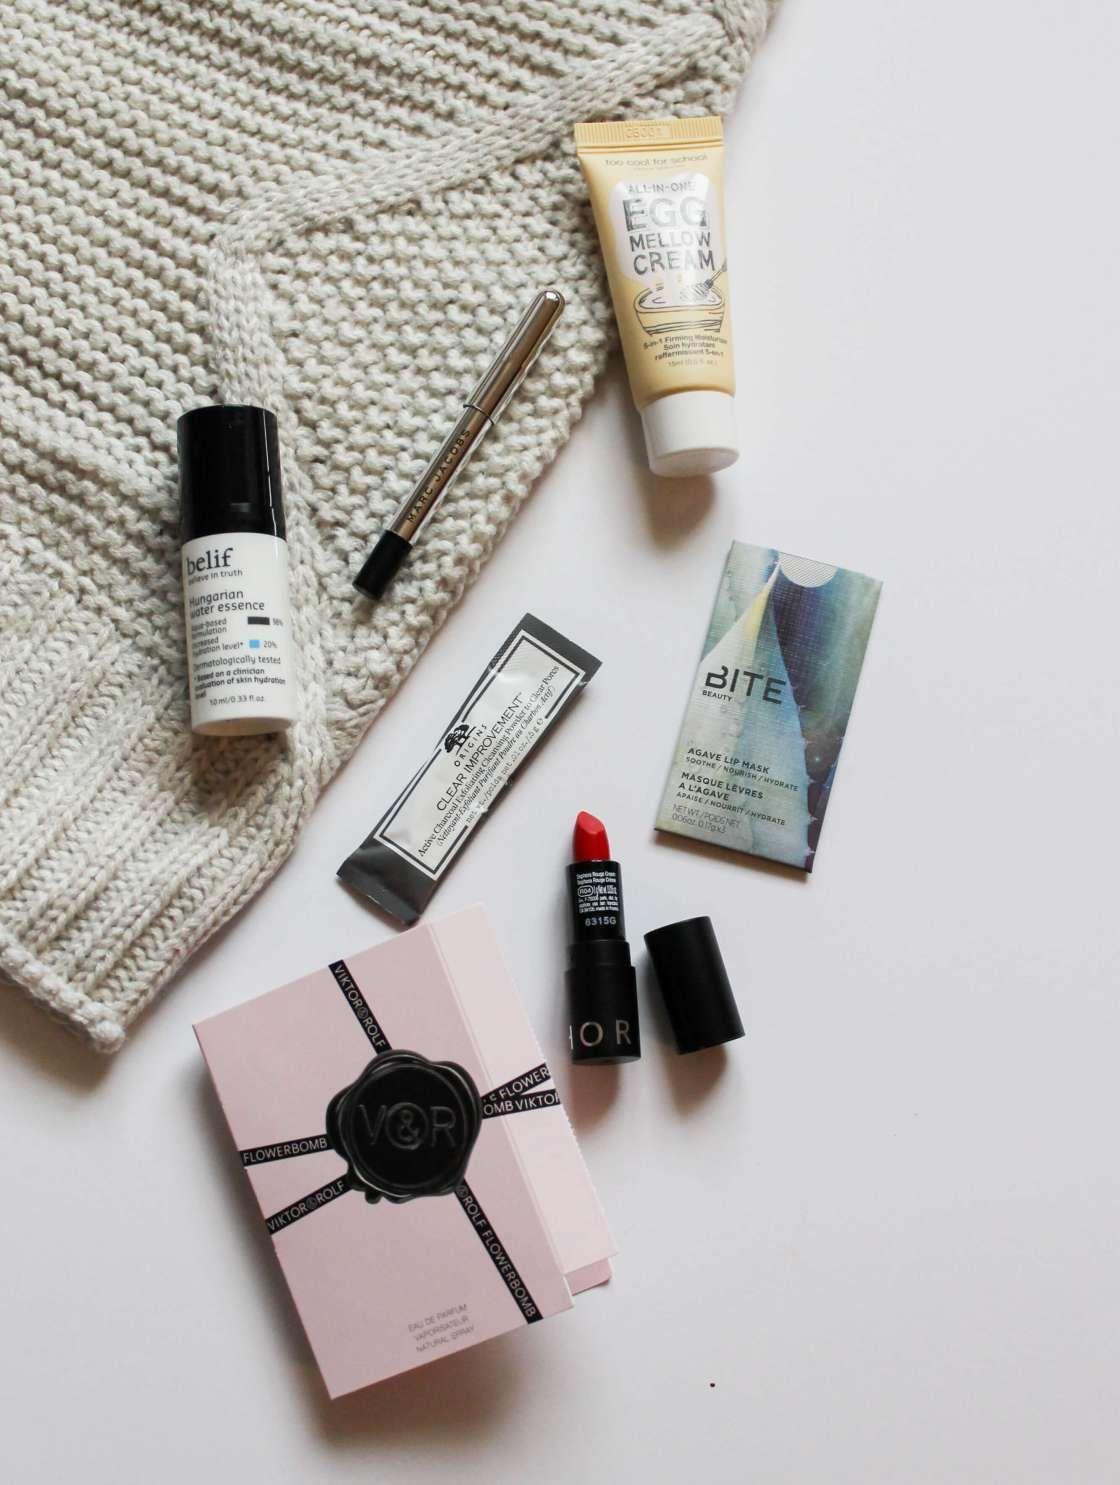 Sephora Samples Stash Sephora, Beauty blogger, Beauty blog